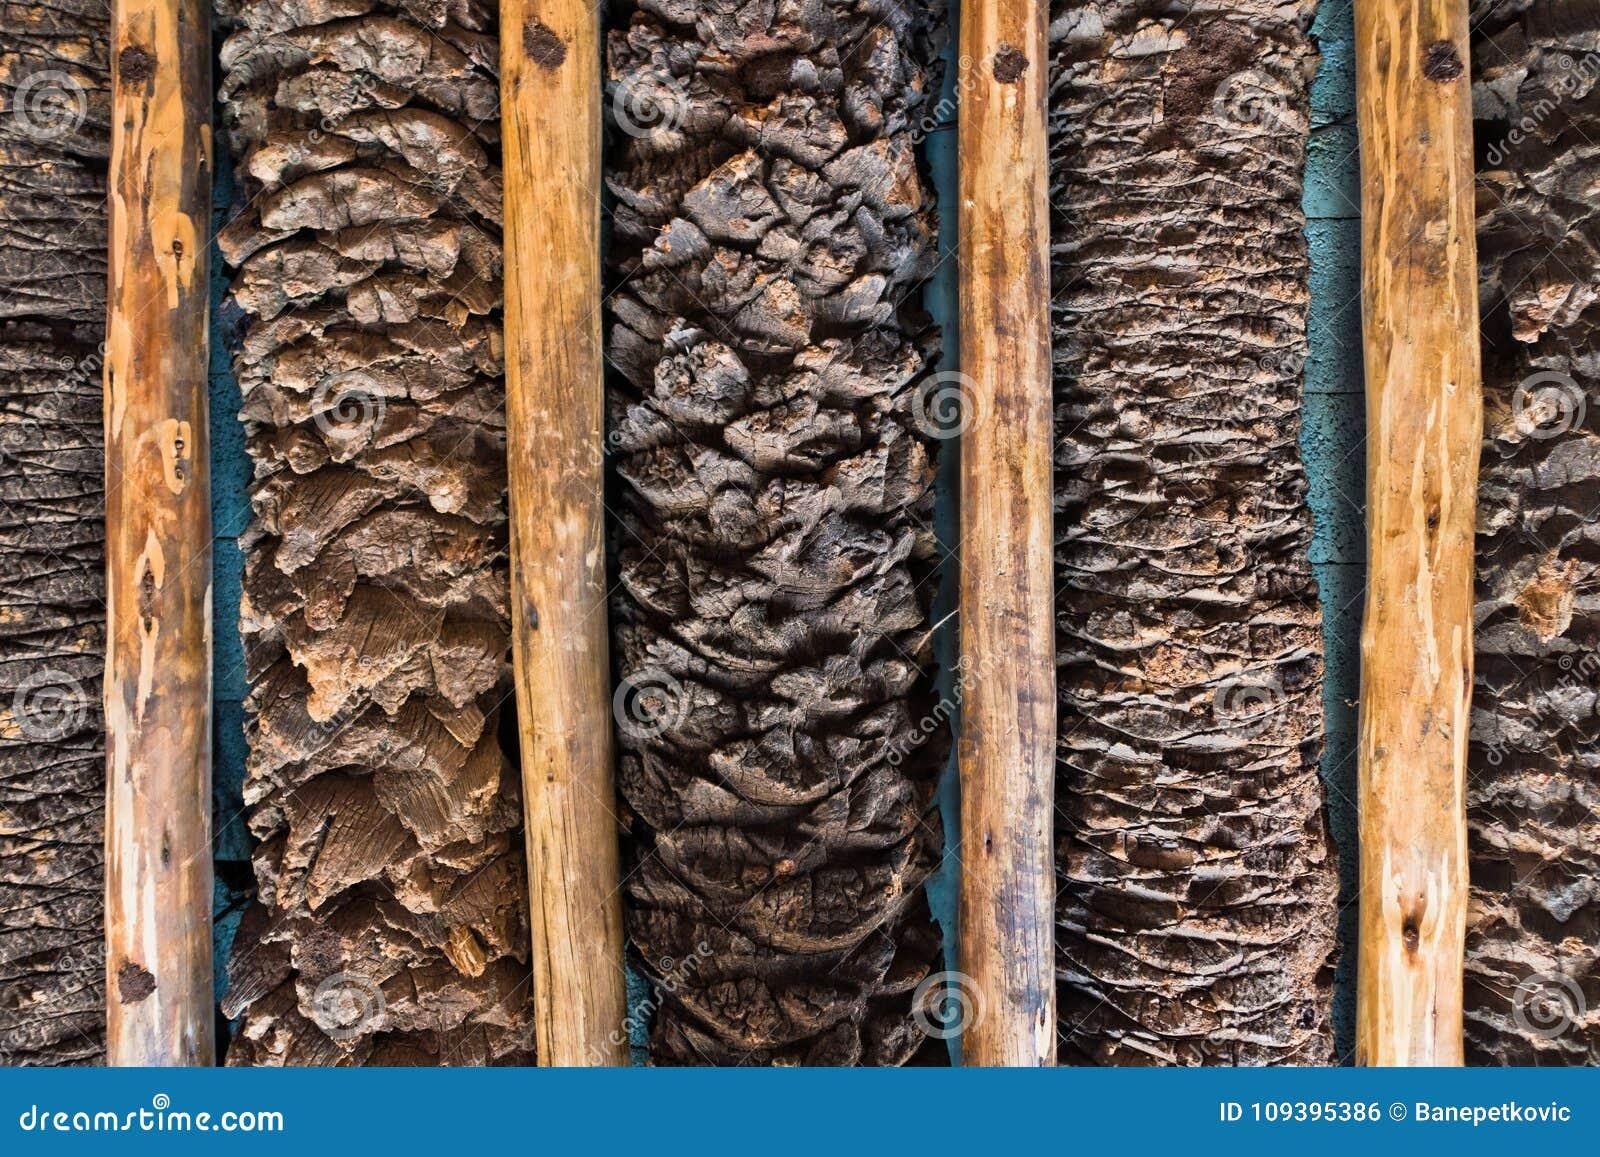 Dubai To See 1st Palm Tree Timber Plant